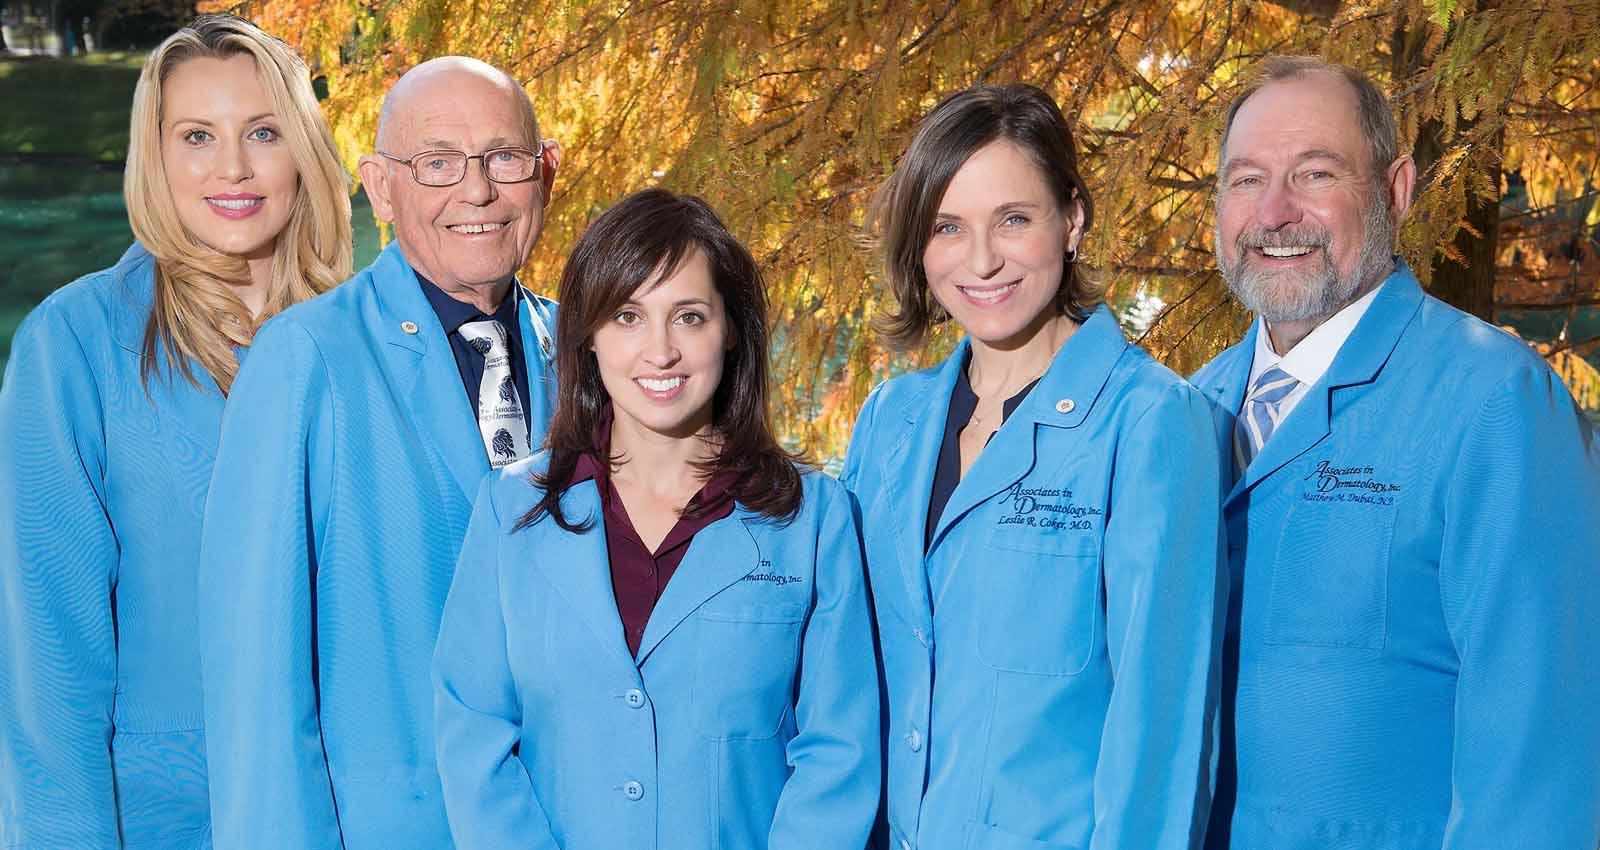 Associates in Dermatology Providers